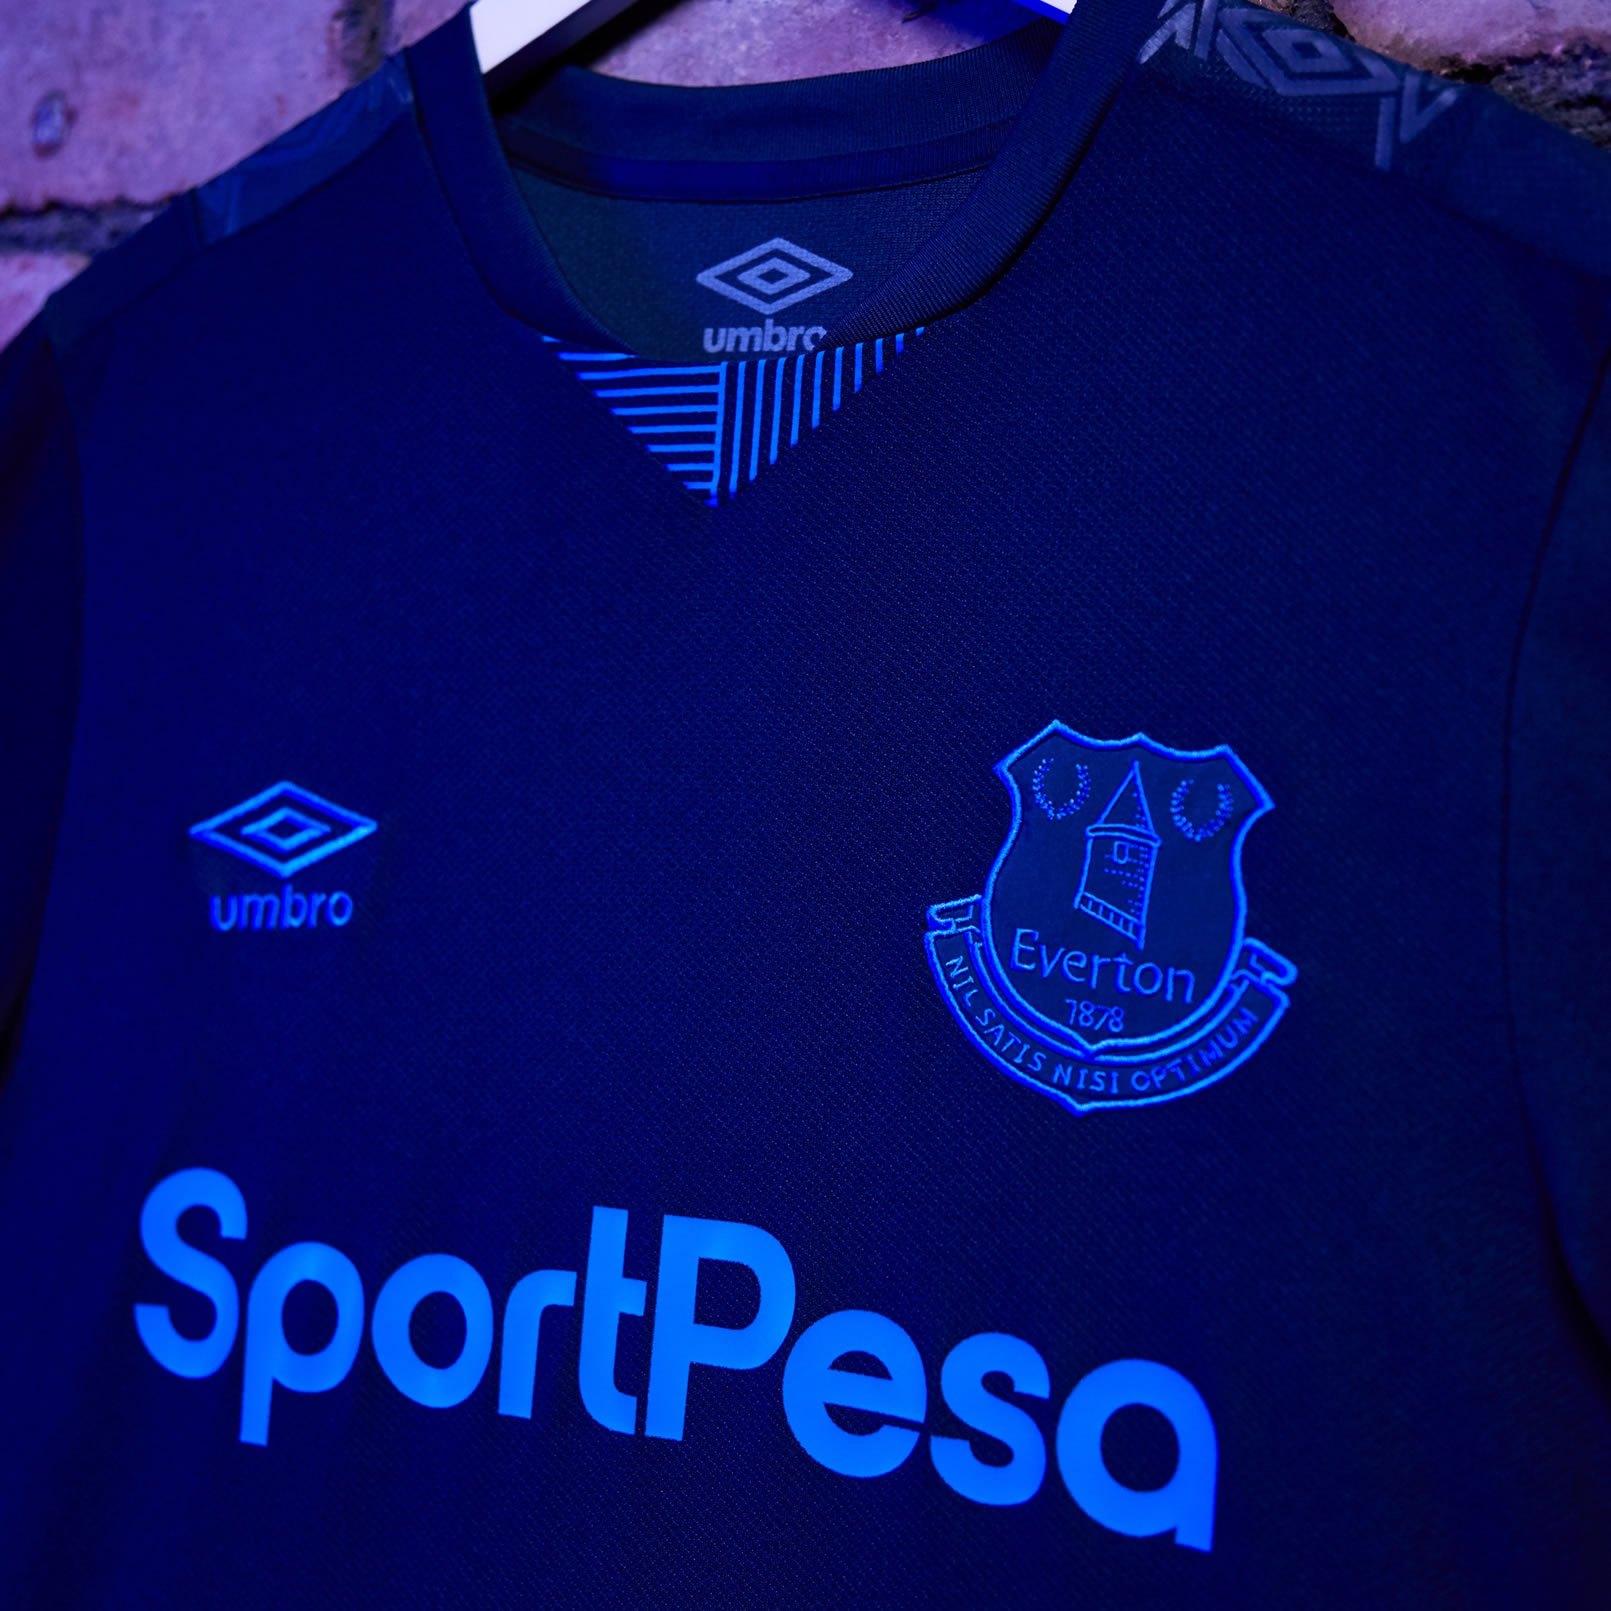 Tercera camiseta Umbro del Everton 2019/2020 | Imagen Twitter Oficial